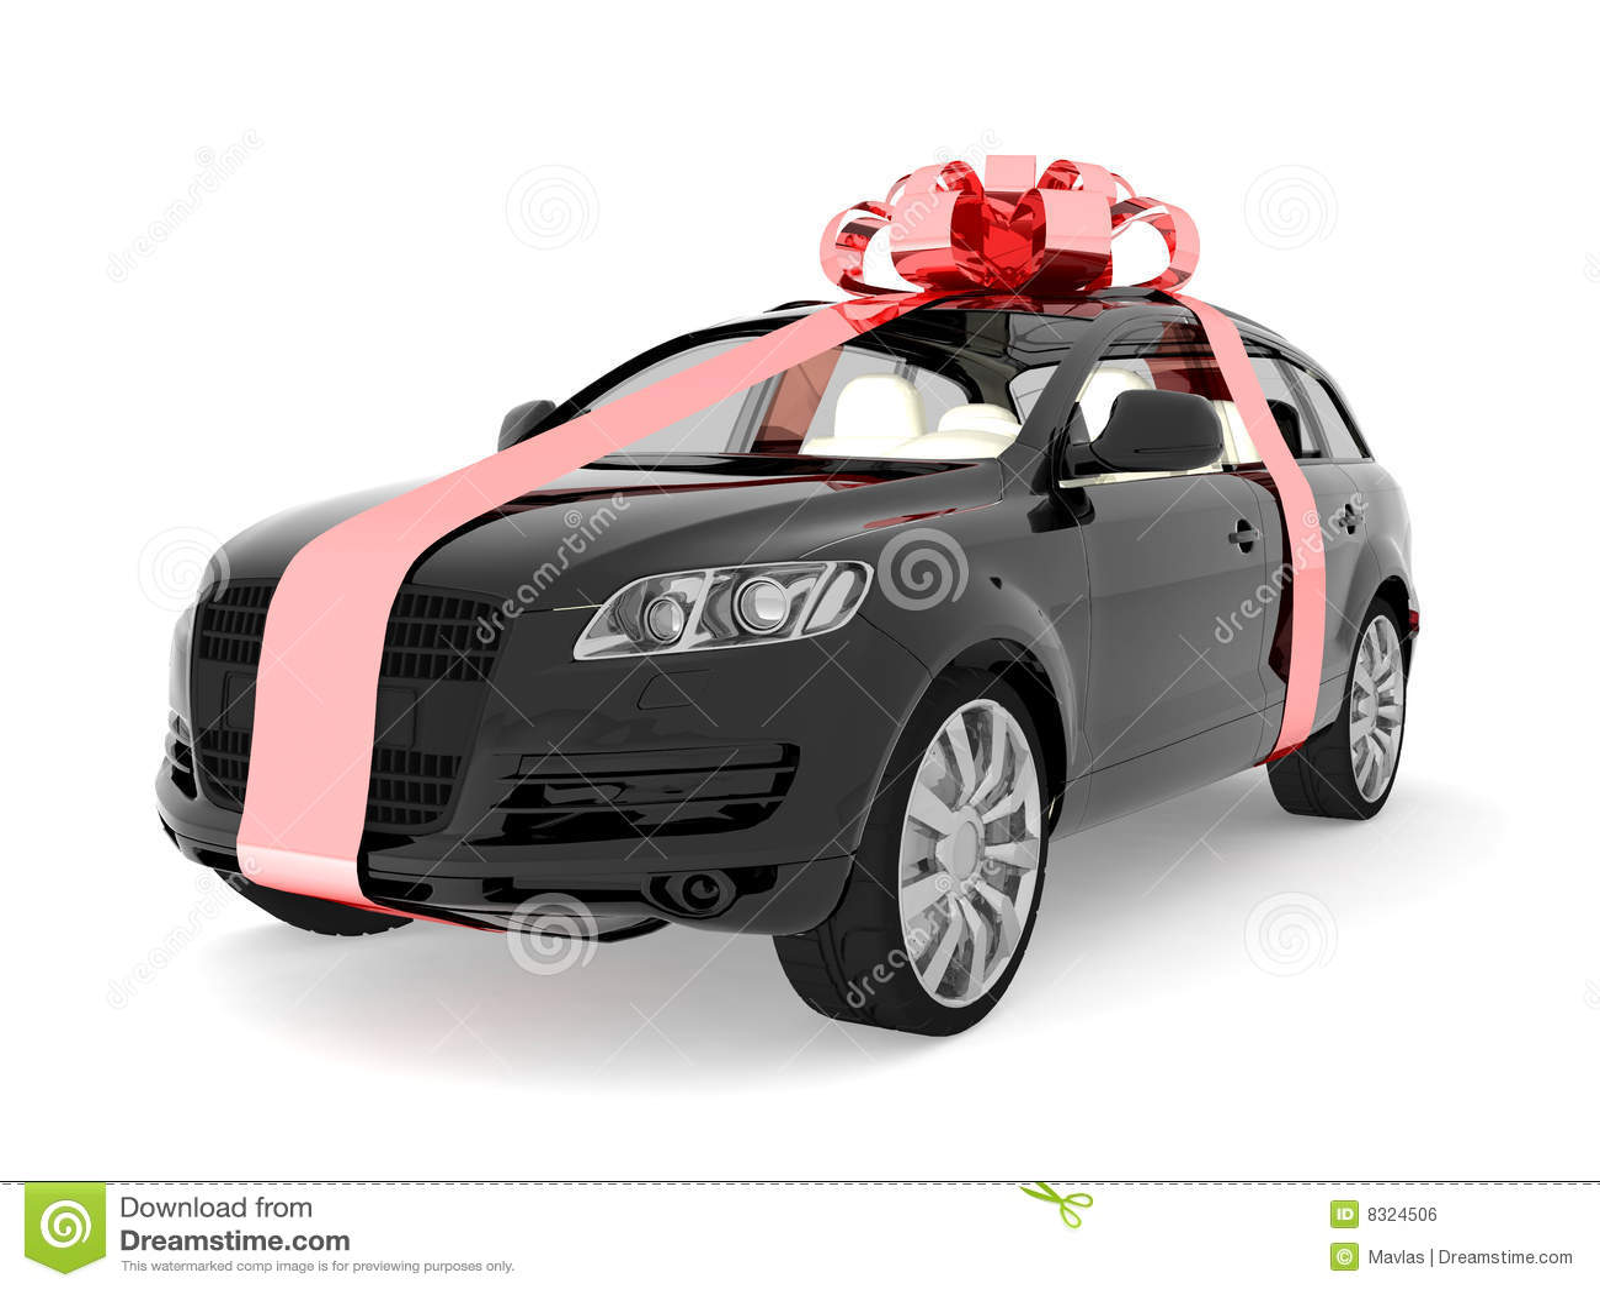 teures auto f r verkauf oder geschenk lizenzfreies stockbild bild 8324506. Black Bedroom Furniture Sets. Home Design Ideas